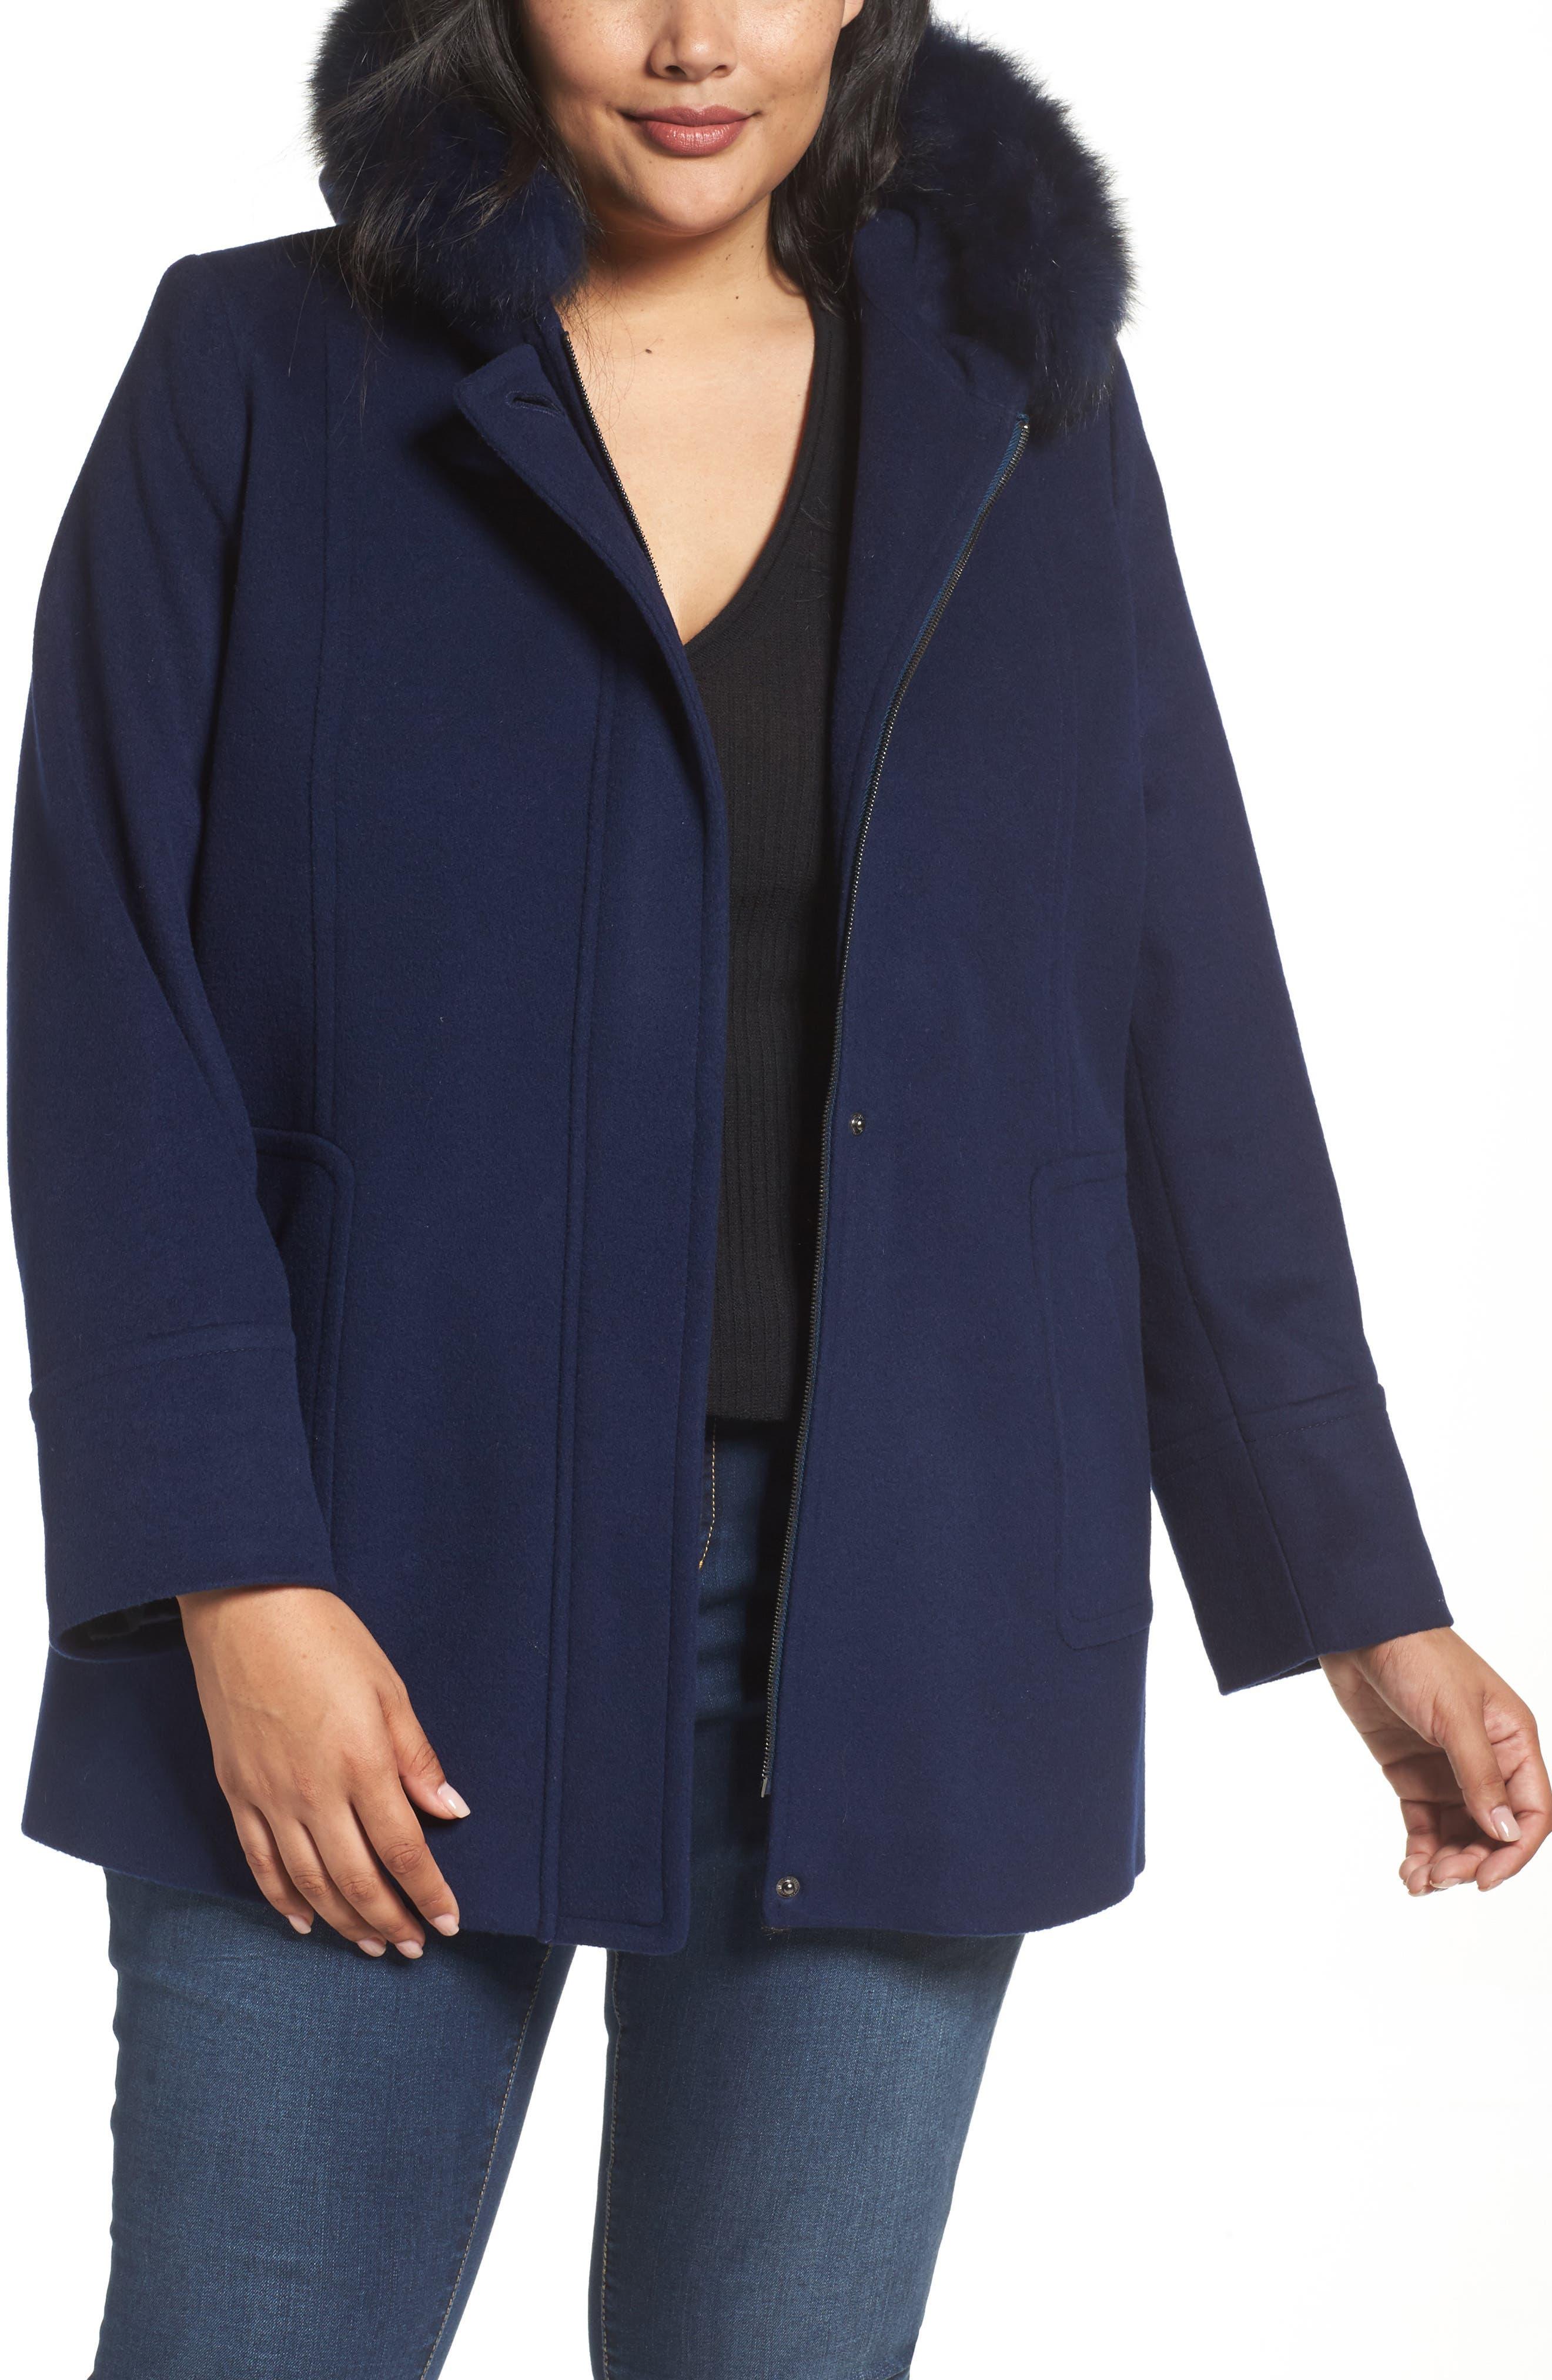 Main Image - Sachi Hooded Wool Blend Coat with Genuine Fox Fur Trim (Plus Size)